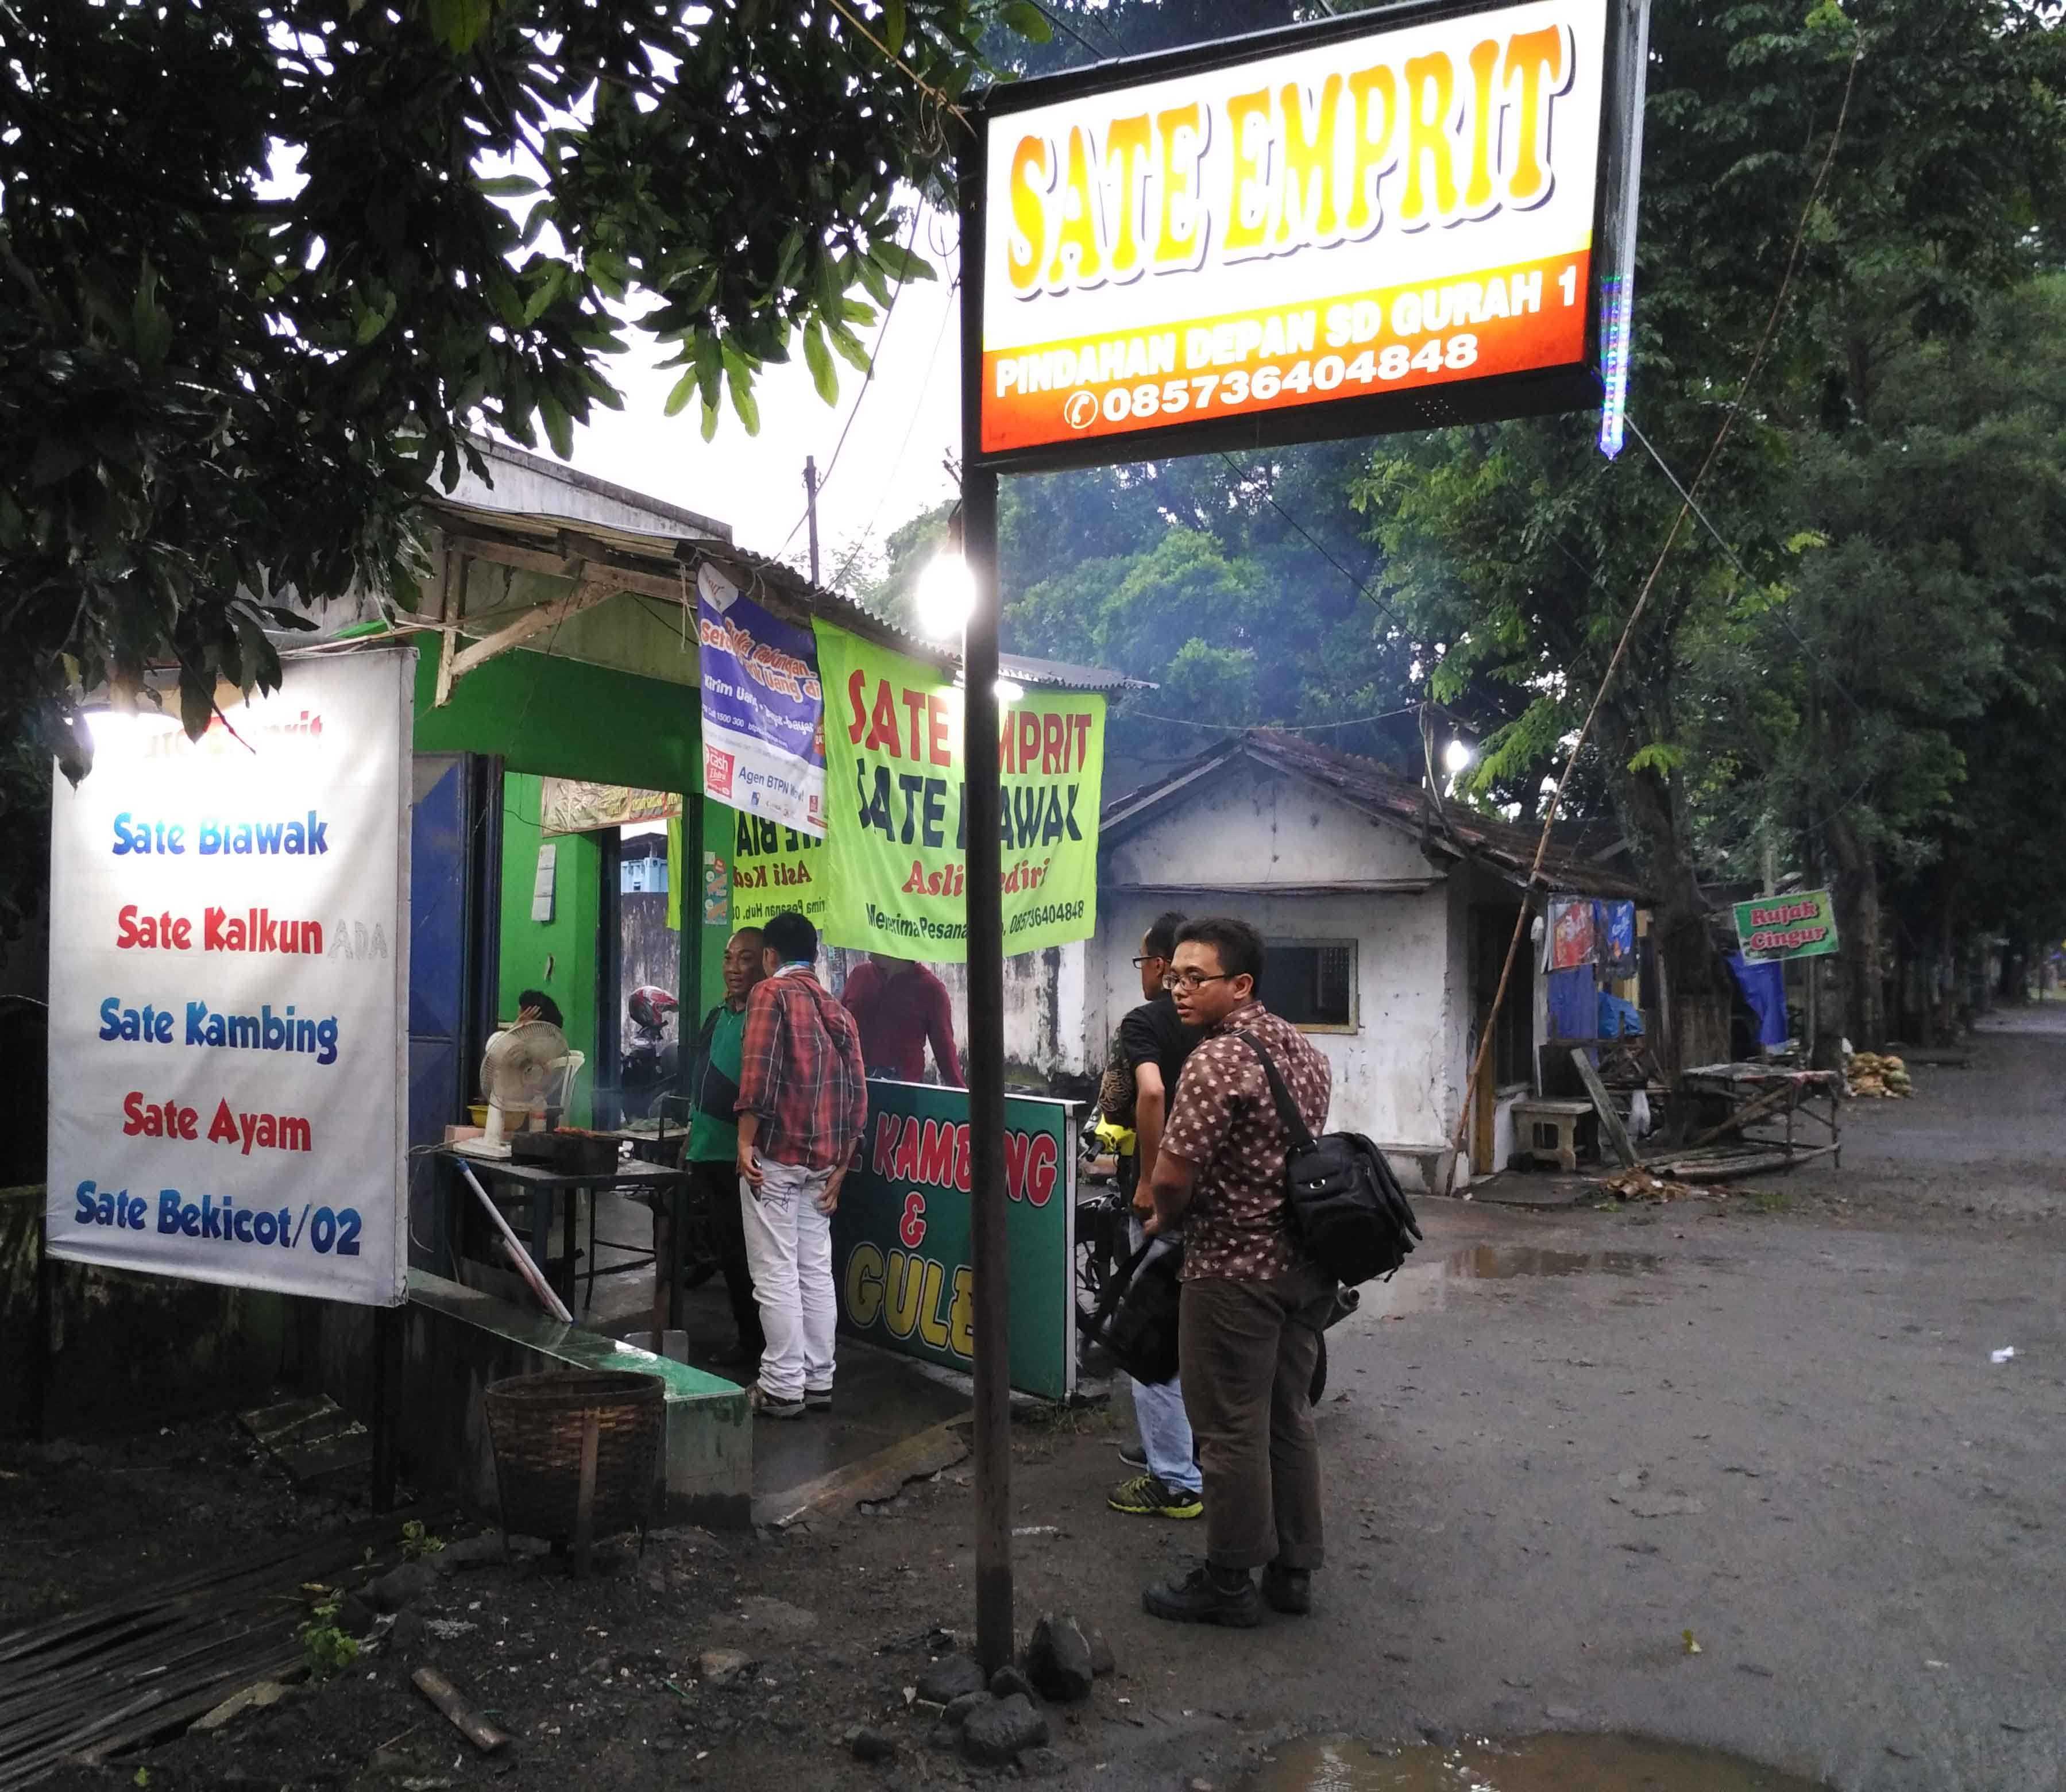 Warung sate emprit milik Darmanto yang ada di Kecamatan Gurah, Kabupaten Kediri, Jawa Timur  (foto: Luana Yunaneva)